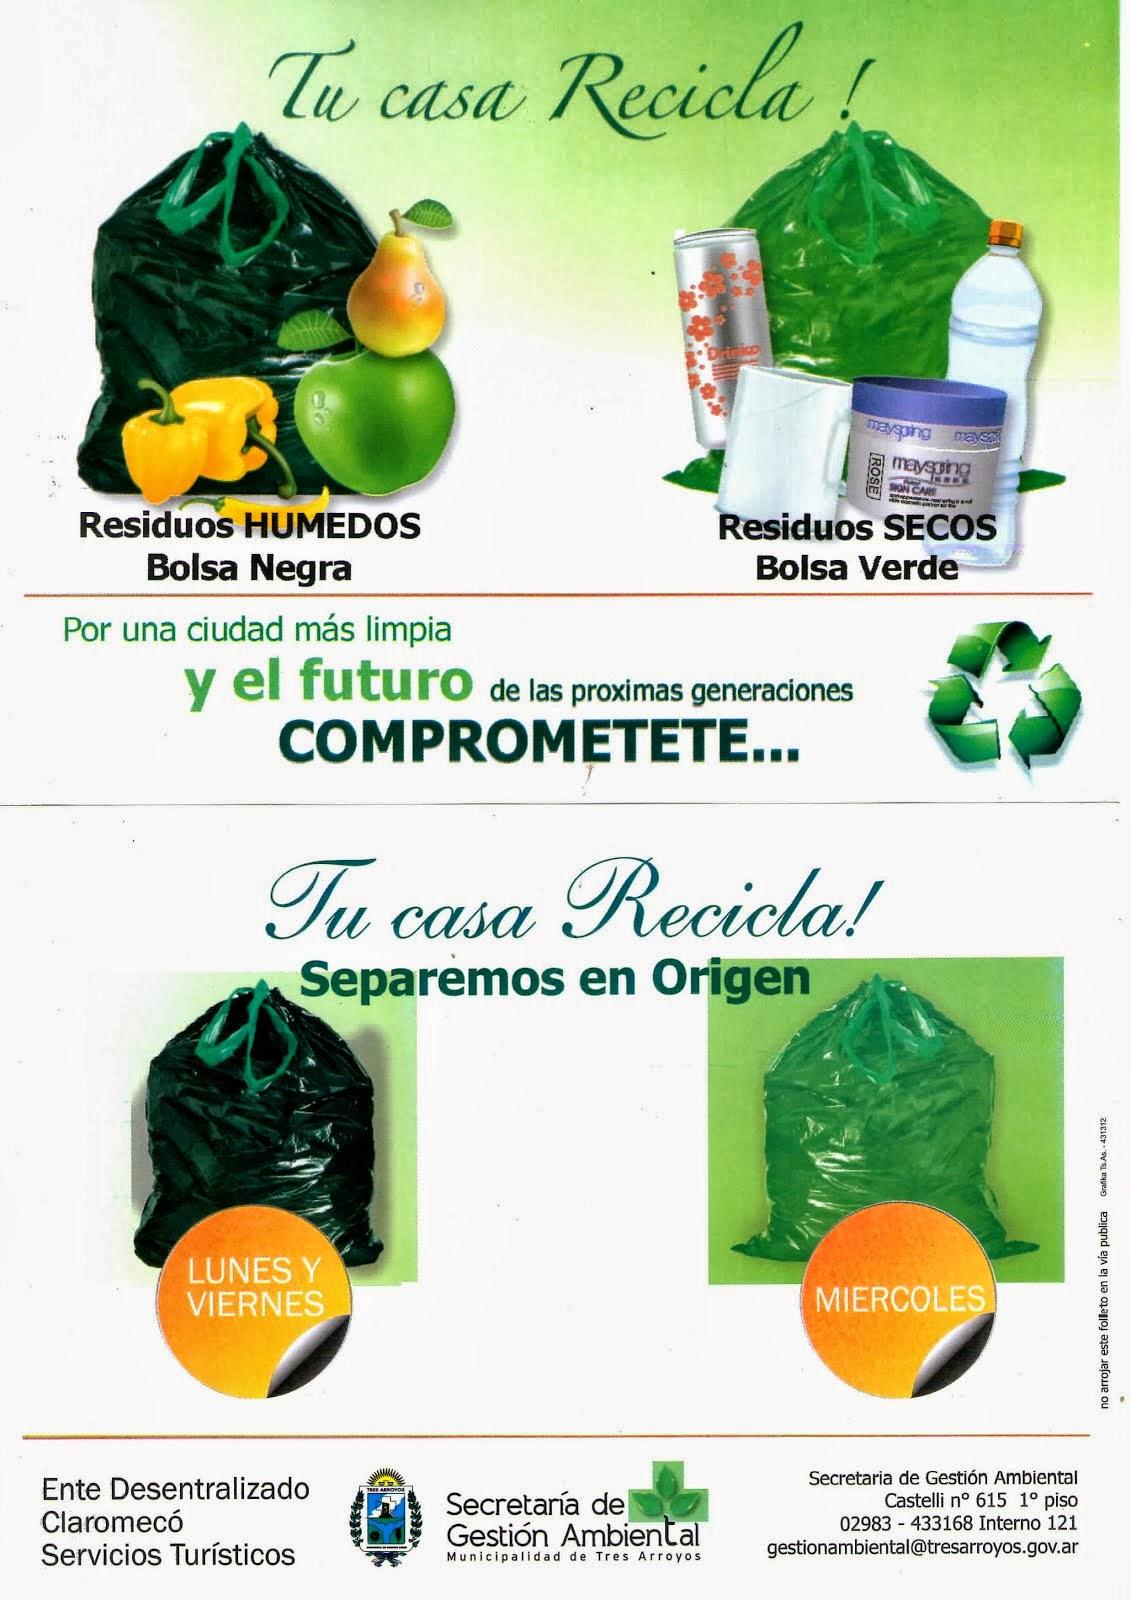 'tu casa recicla' en claromecó